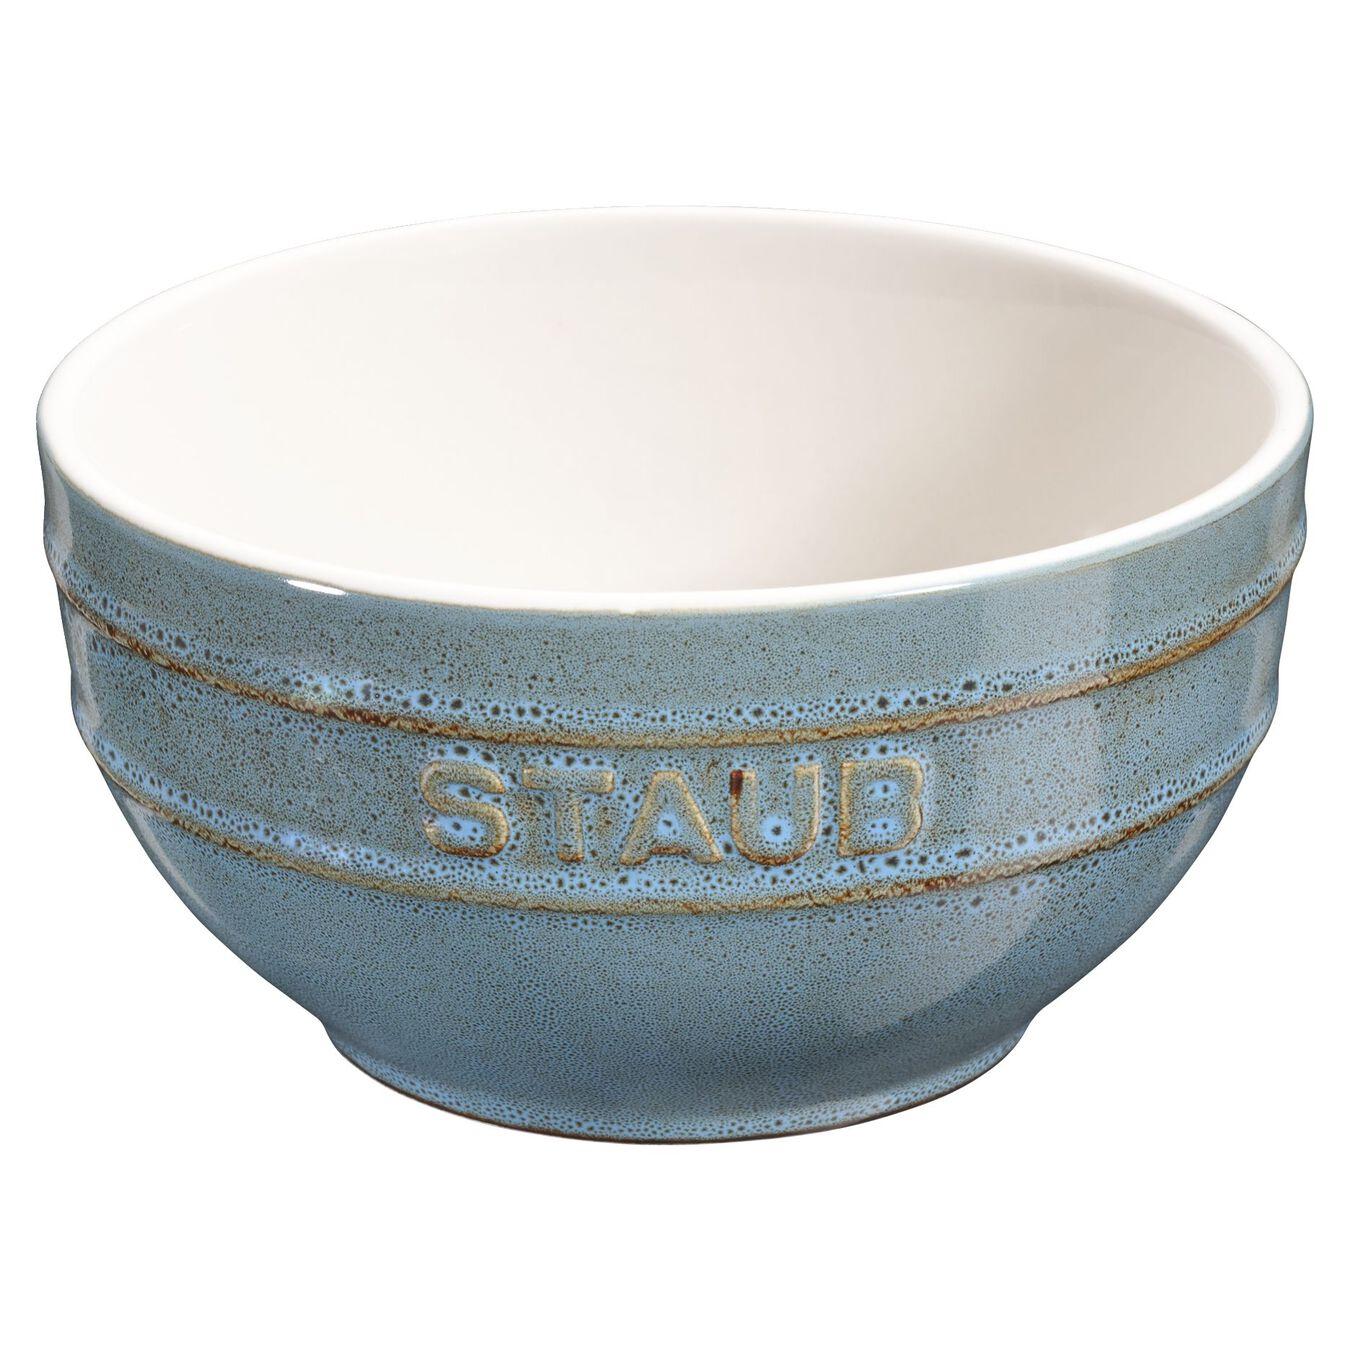 Bol 14 cm / 0.7 l, Turquoise antique,,large 1